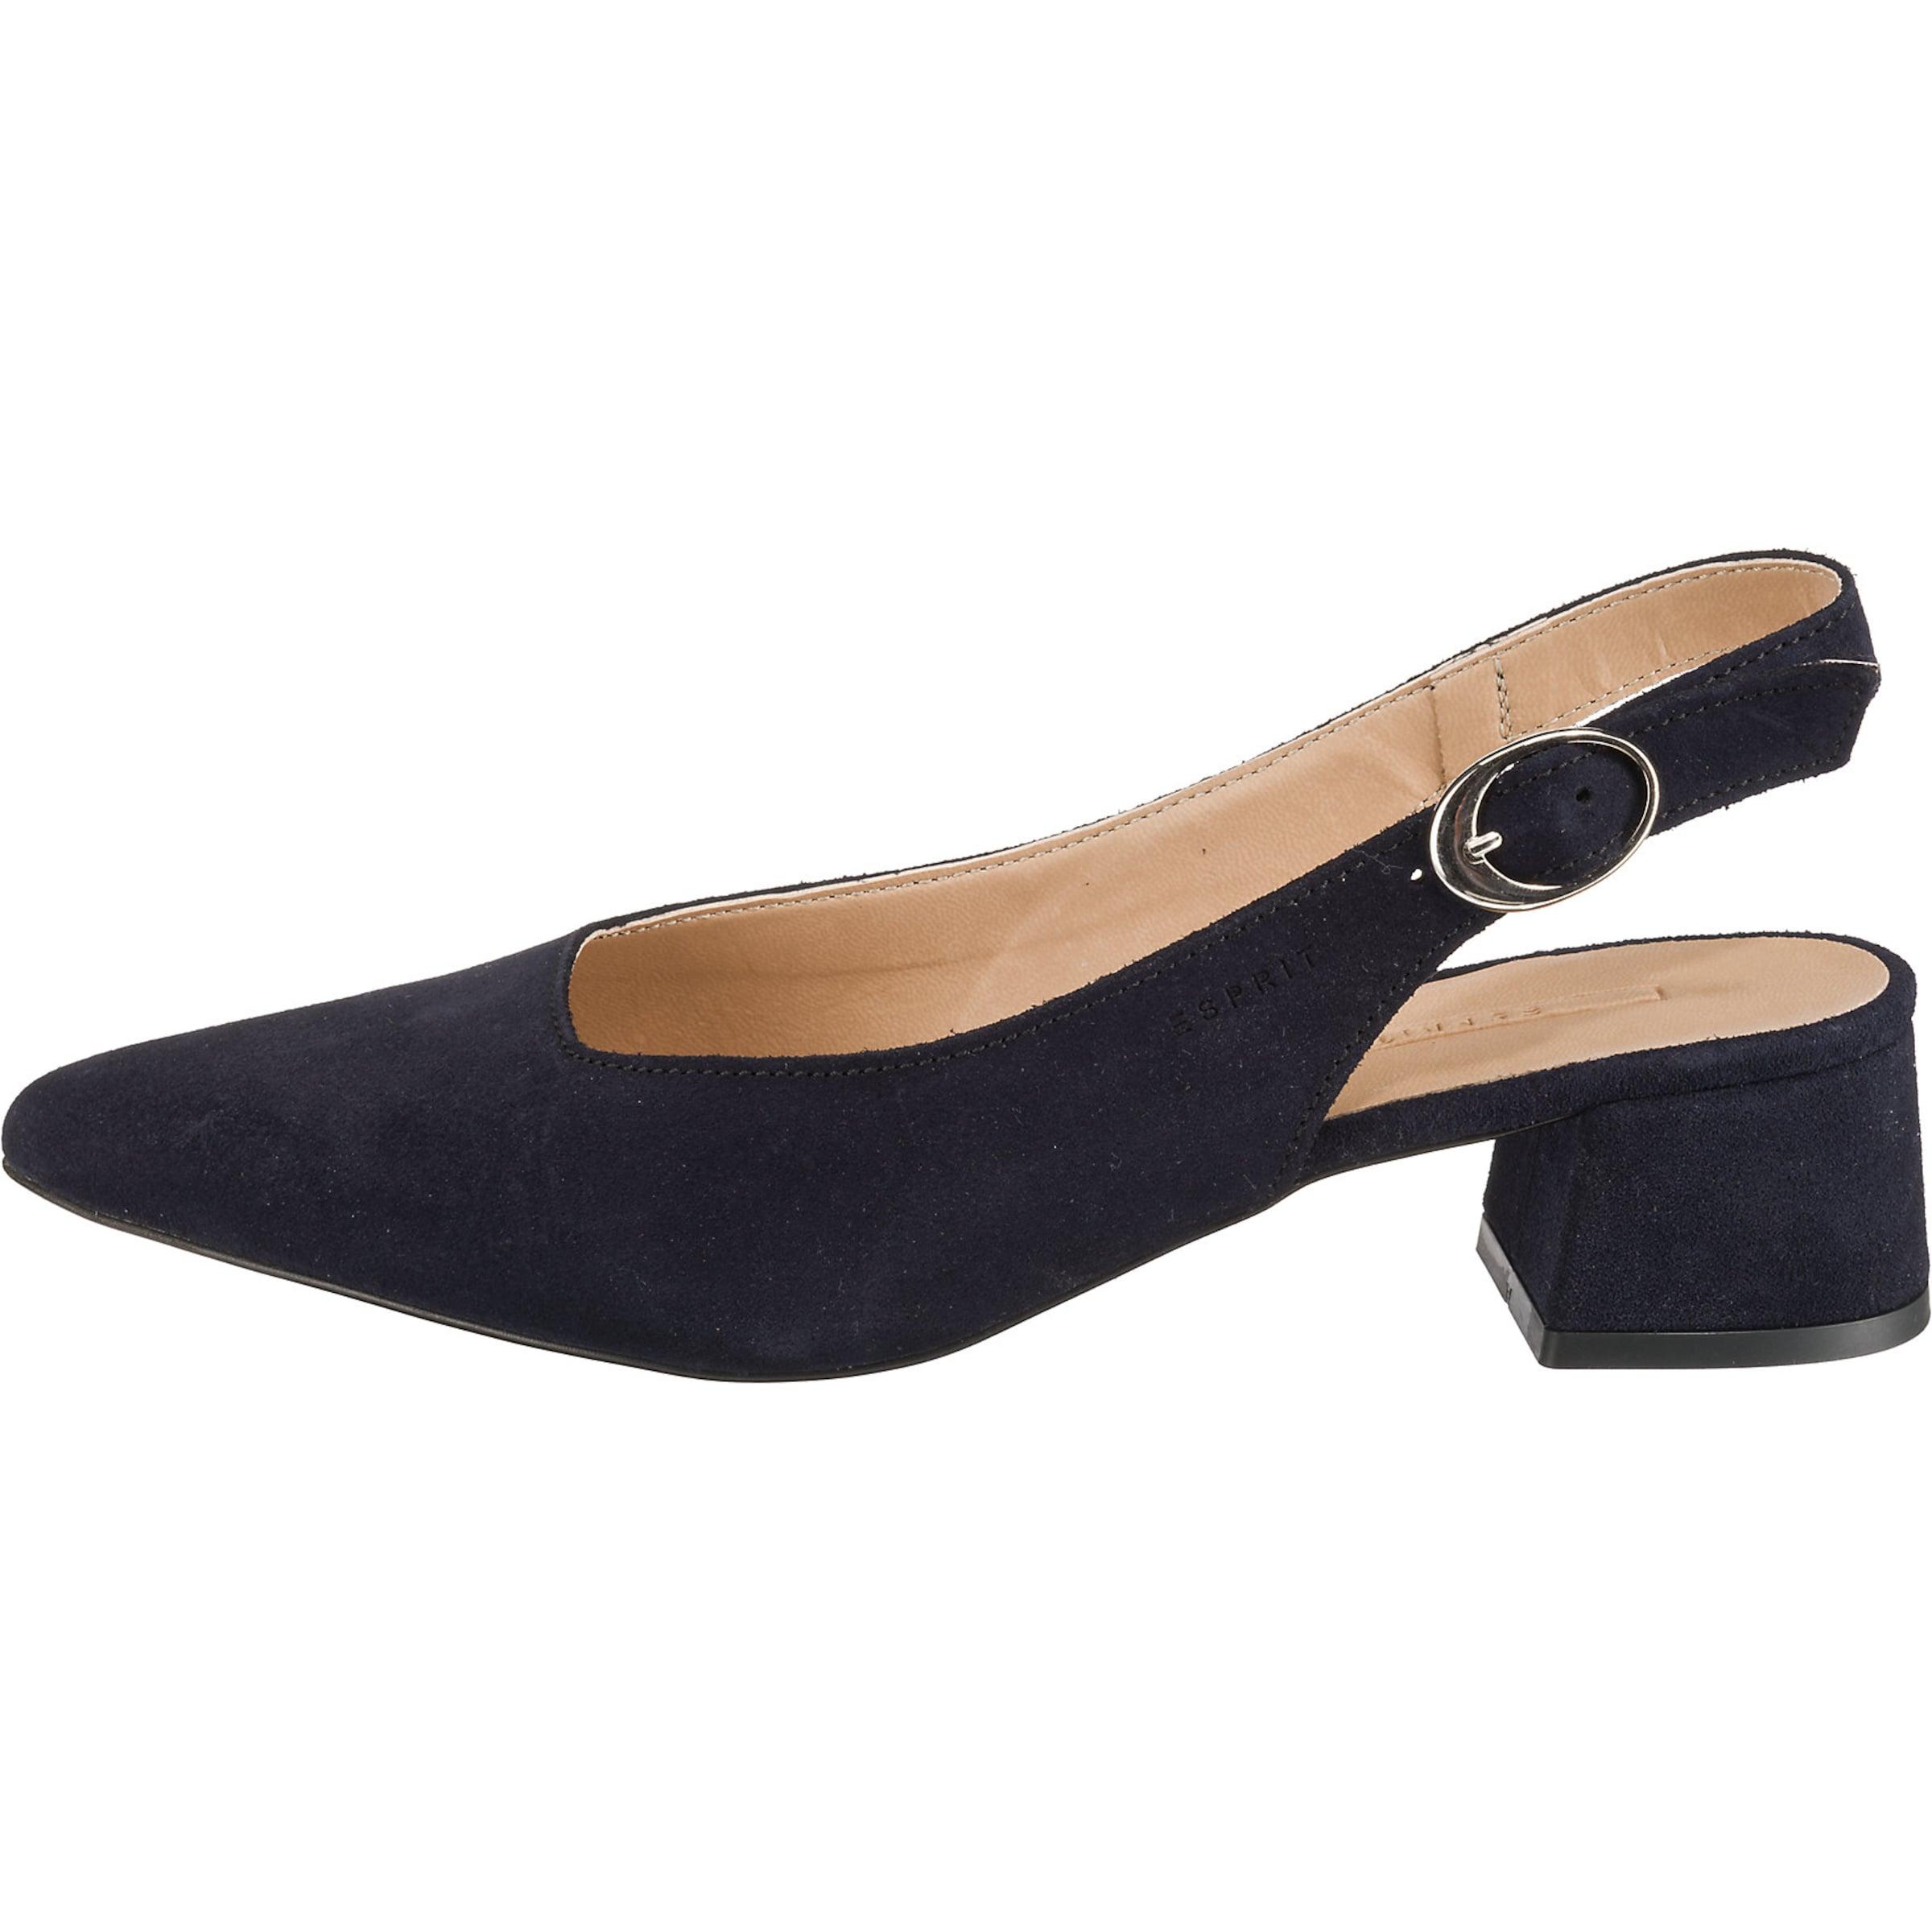 'zina Sling' In Esprit Sling Blau pumps xoWdrBeC